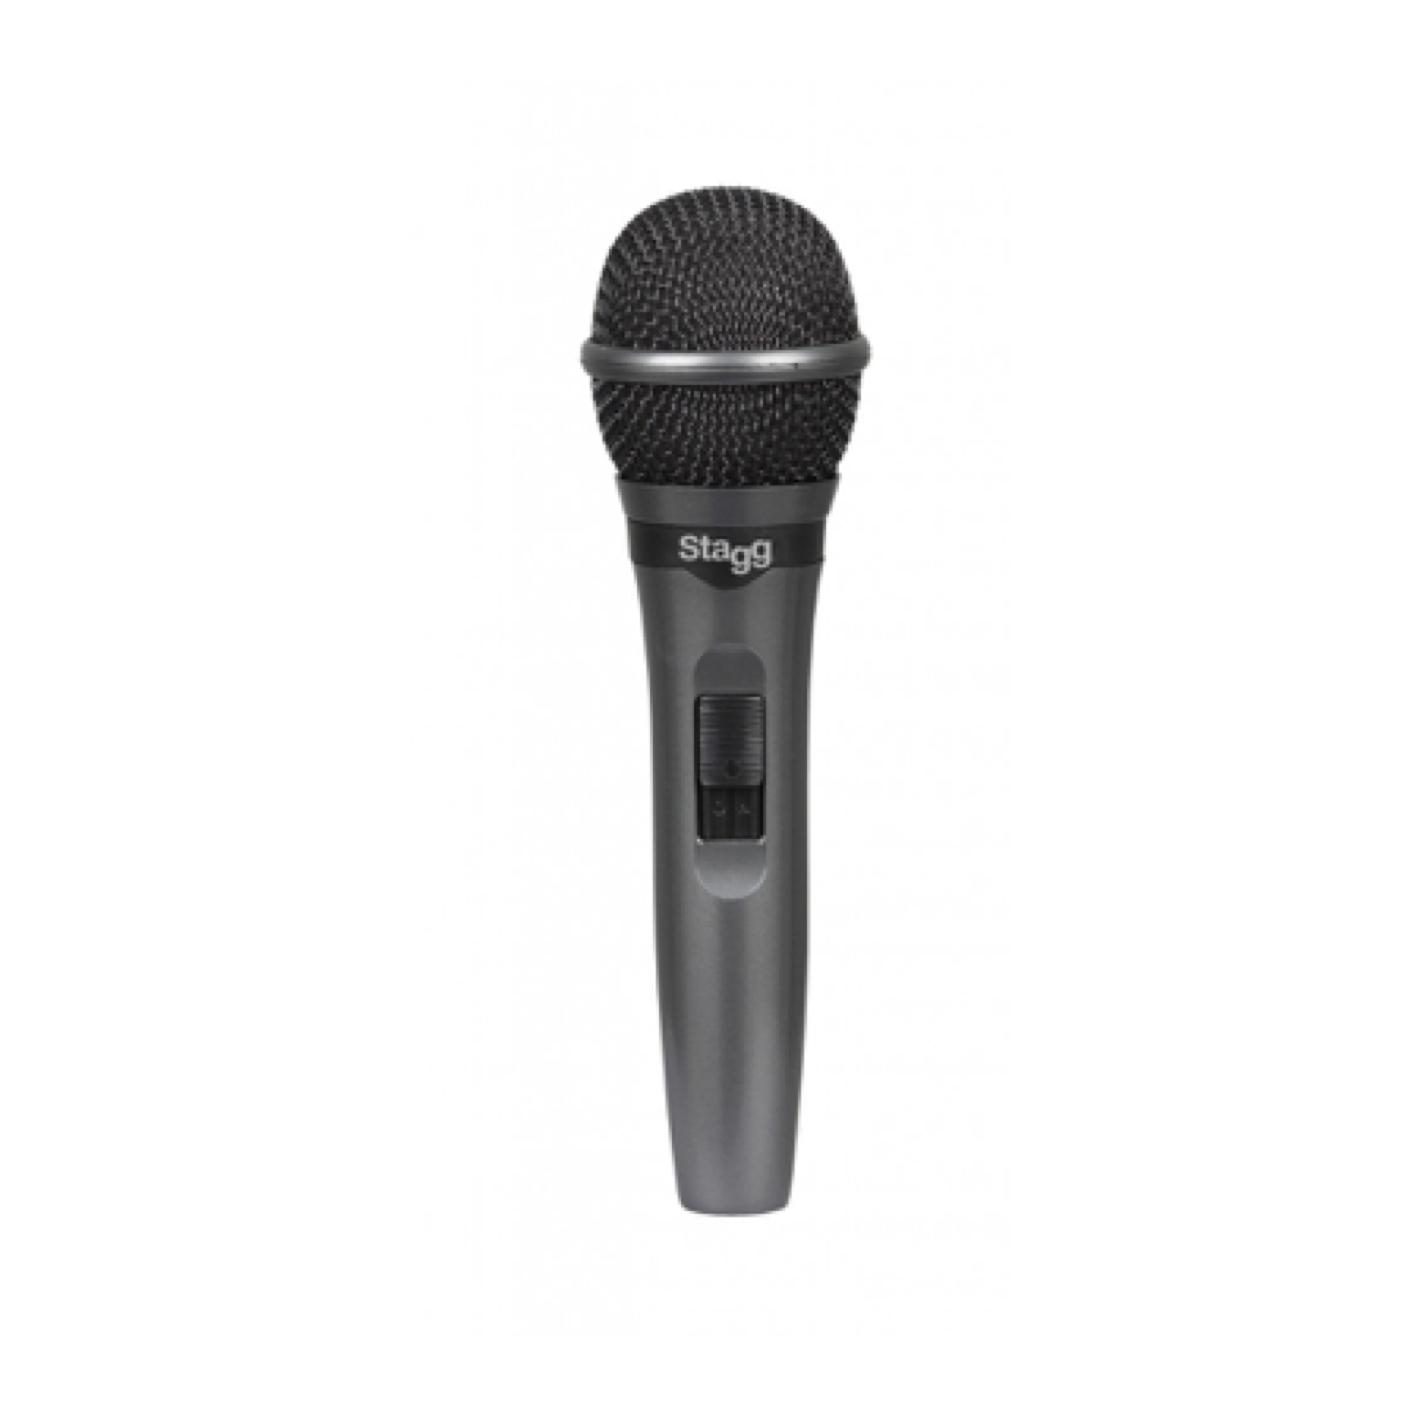 Stagg SDMP15 Dynamic Microphone